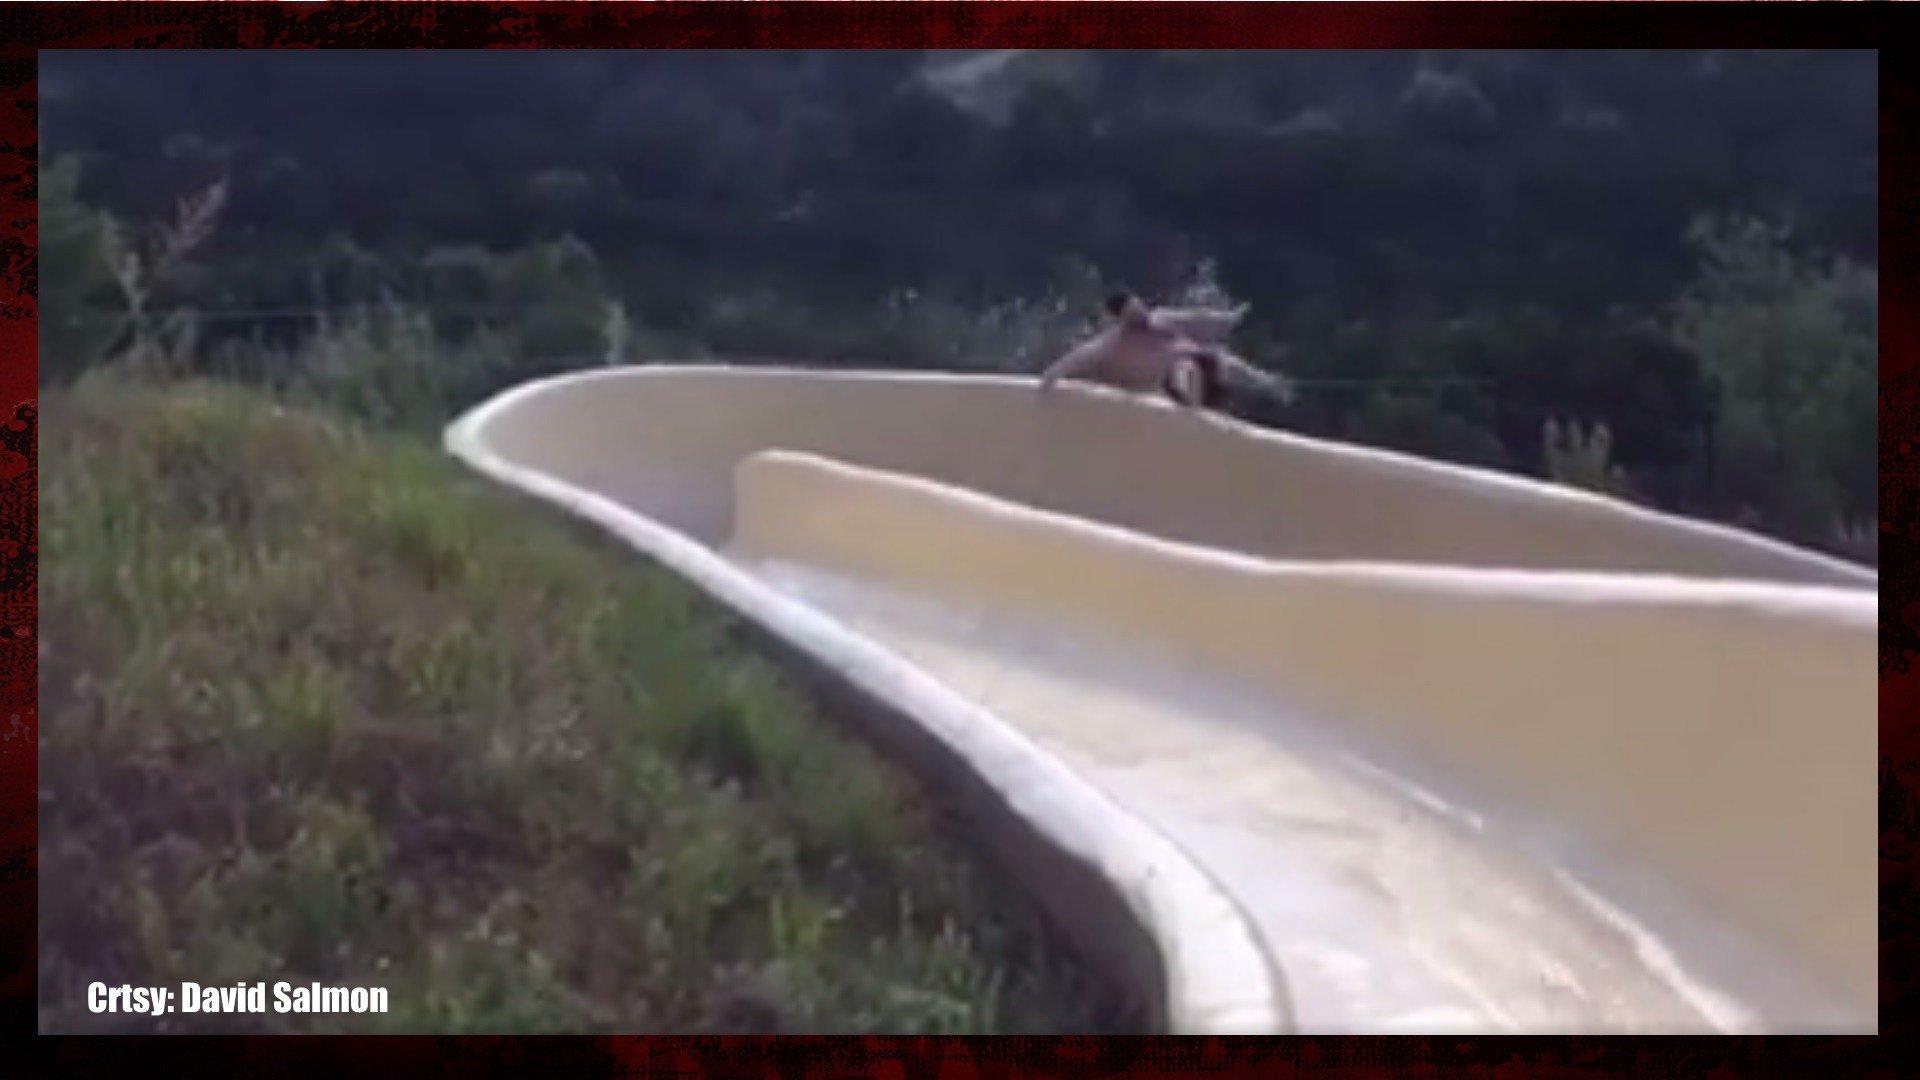 Man flies off water slide down rocky cliff